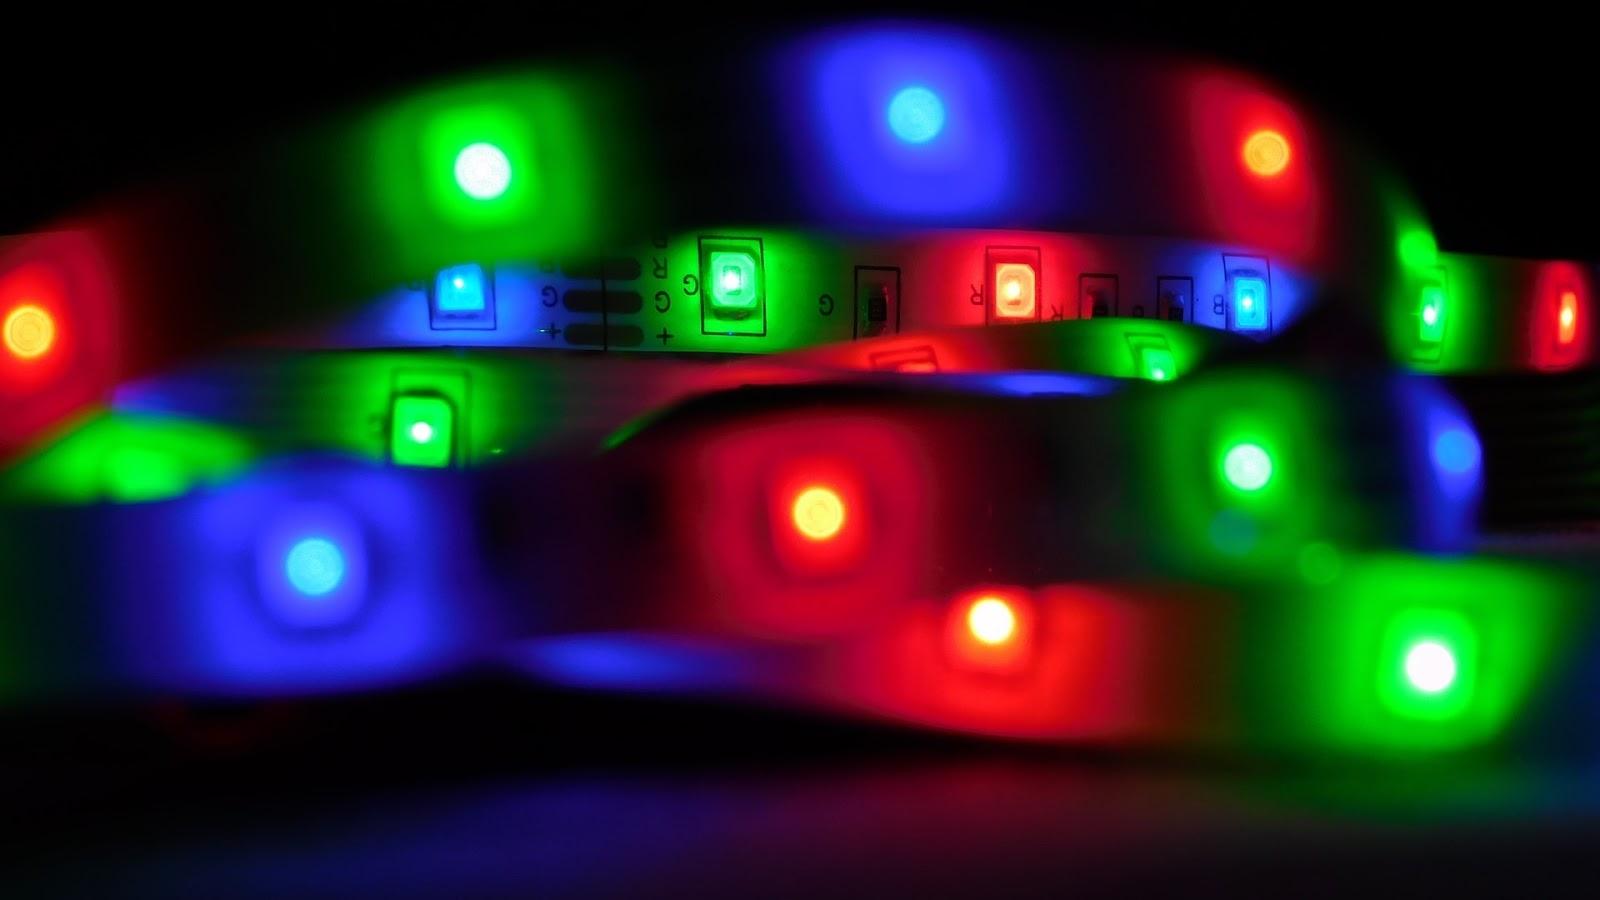 A string of LED lights.